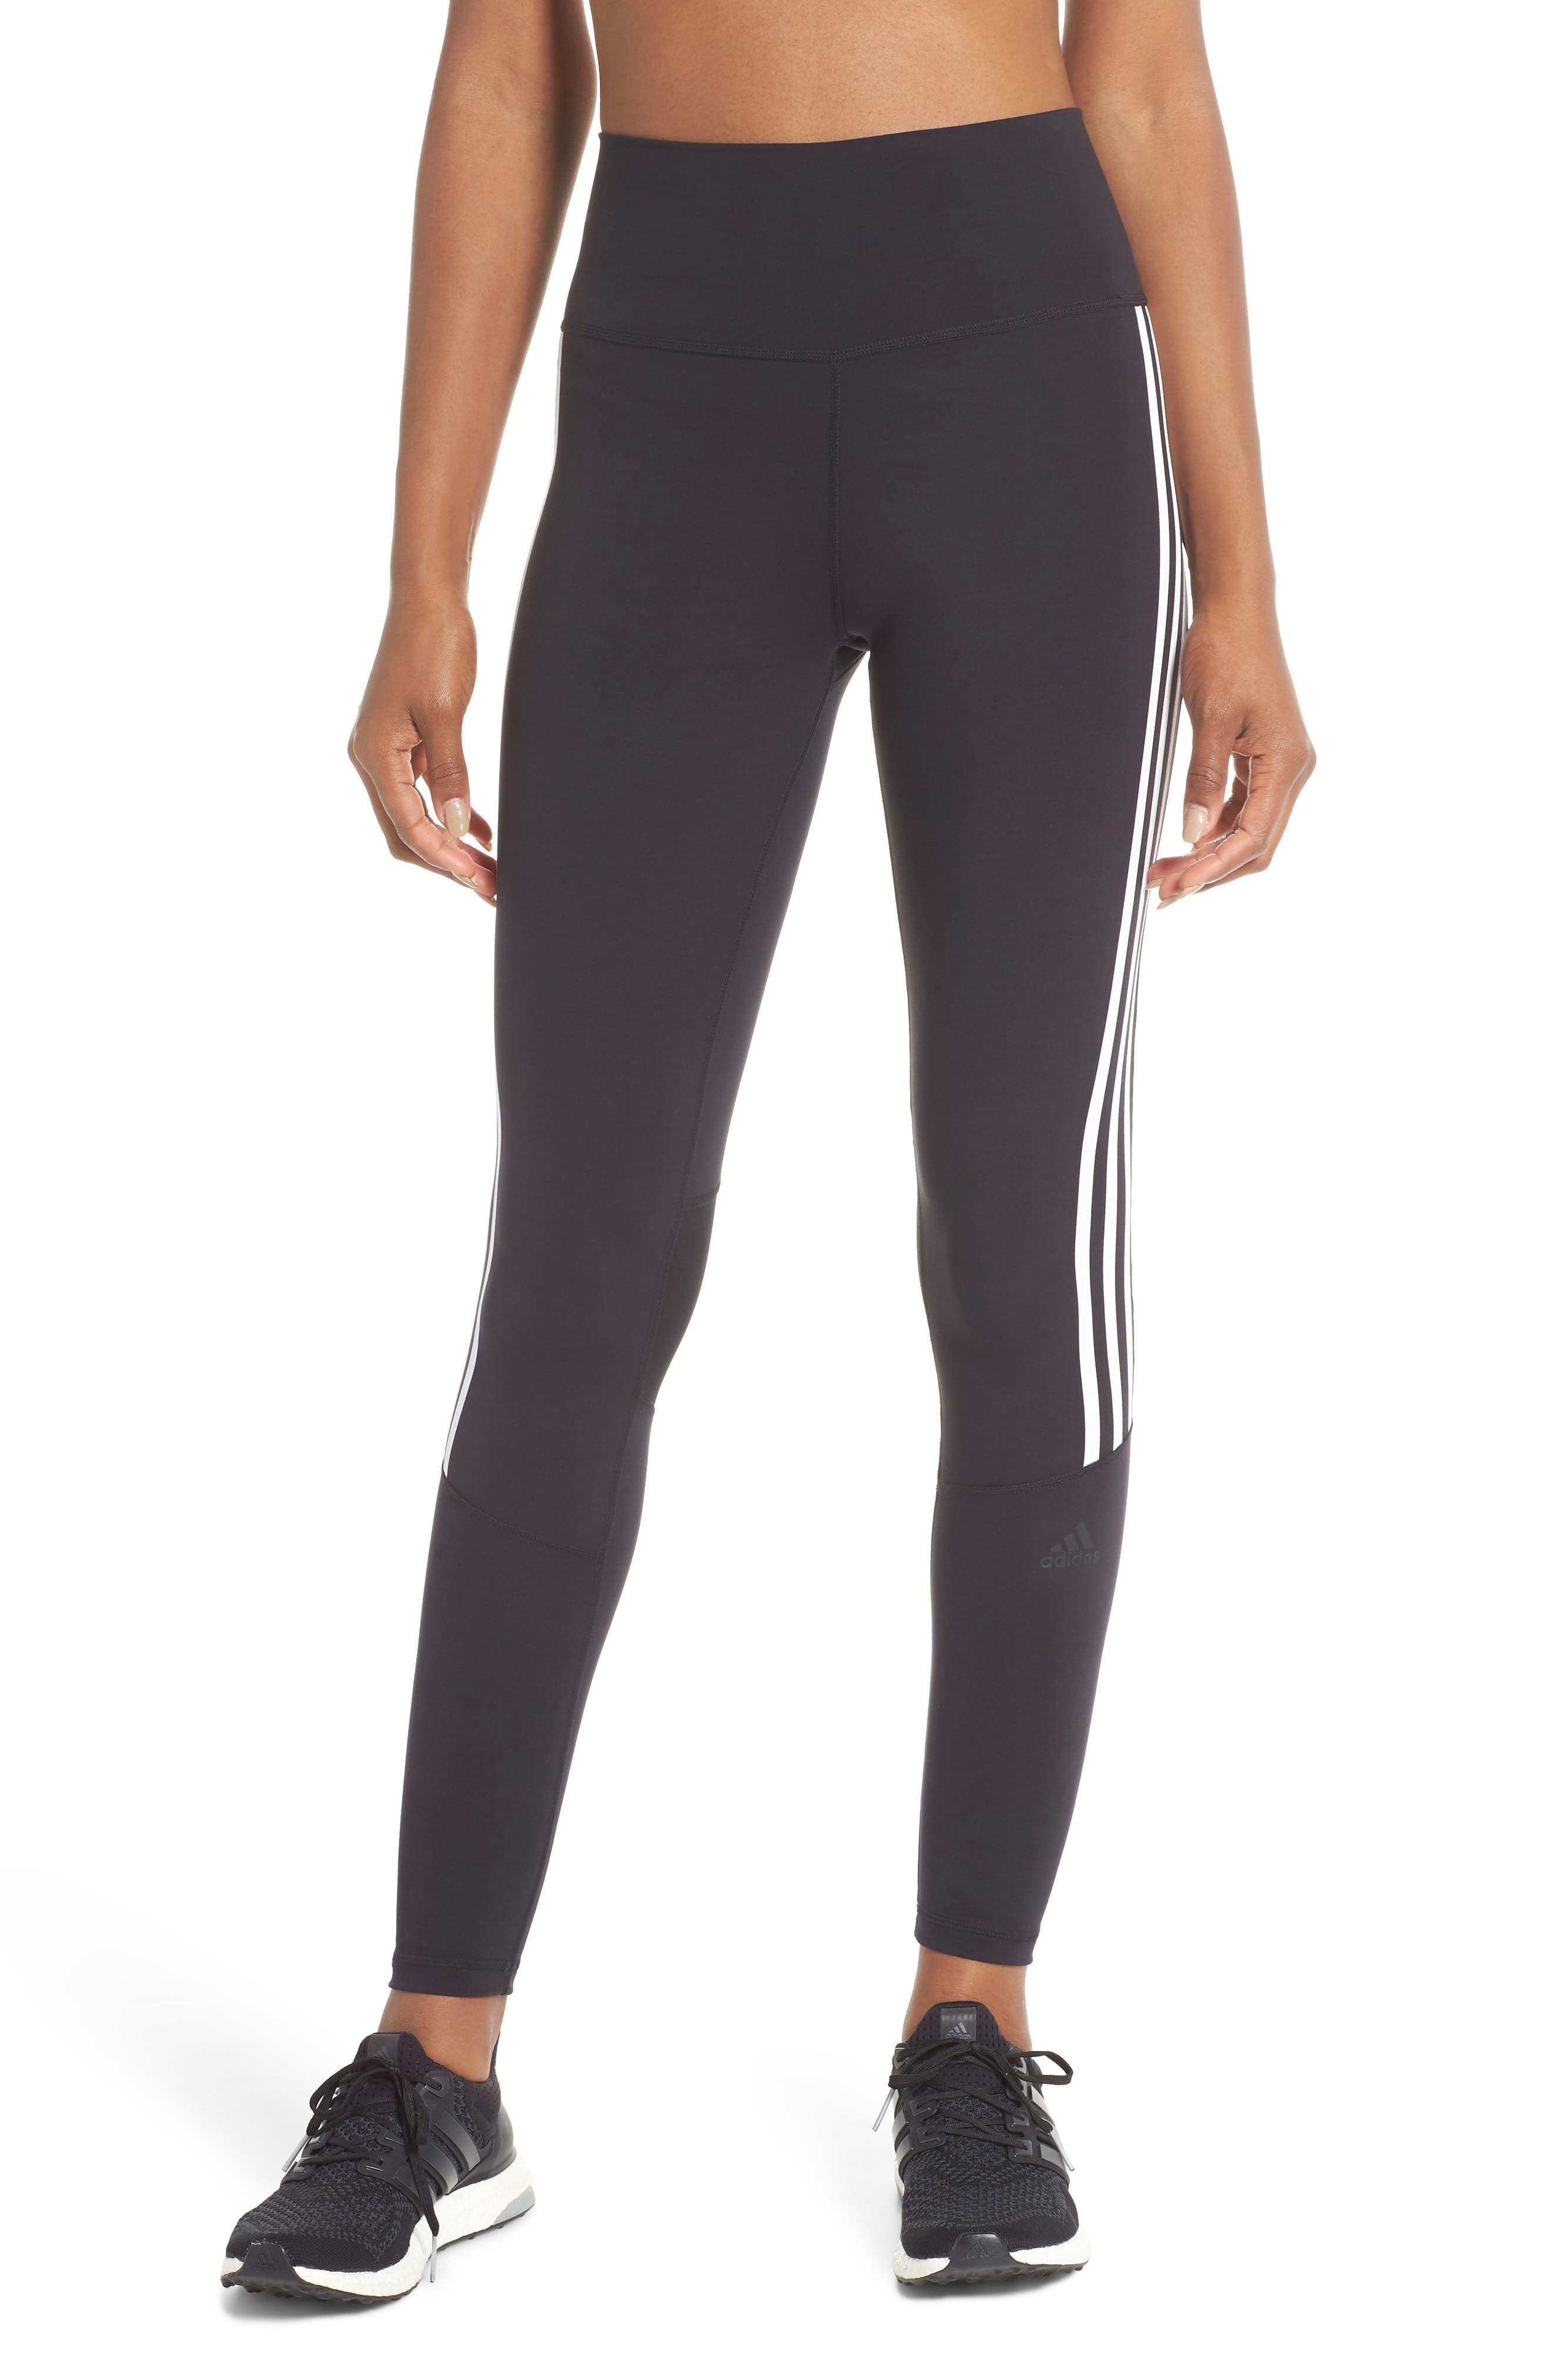 Believe This 3-Stripes High Waist Ankle Leggings,                             Main thumbnail 1, color,                             BLACK/ WHITE